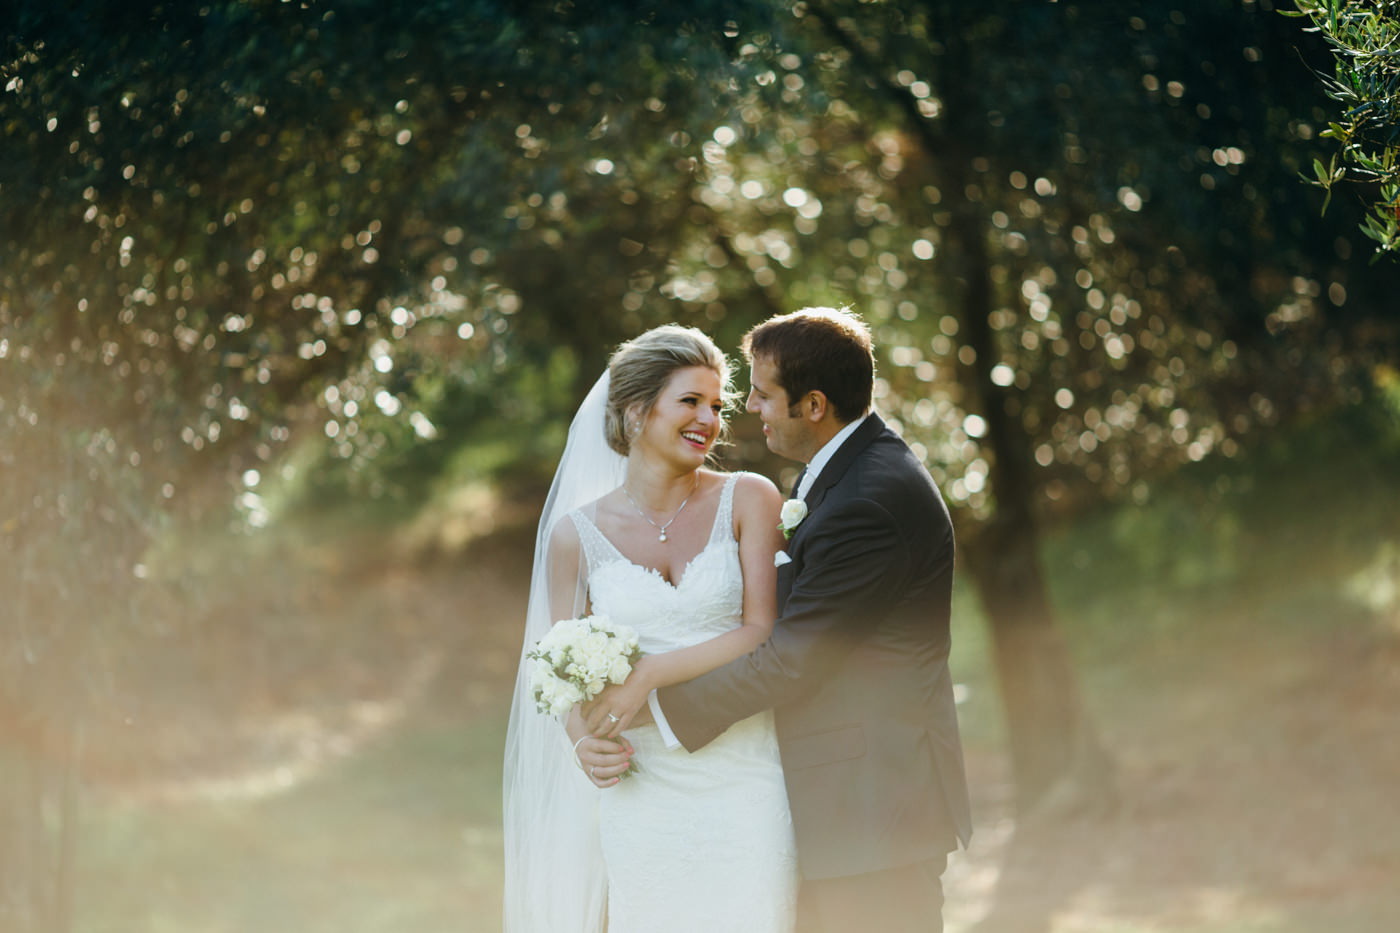 bracu_wedding_photos1058.jpg